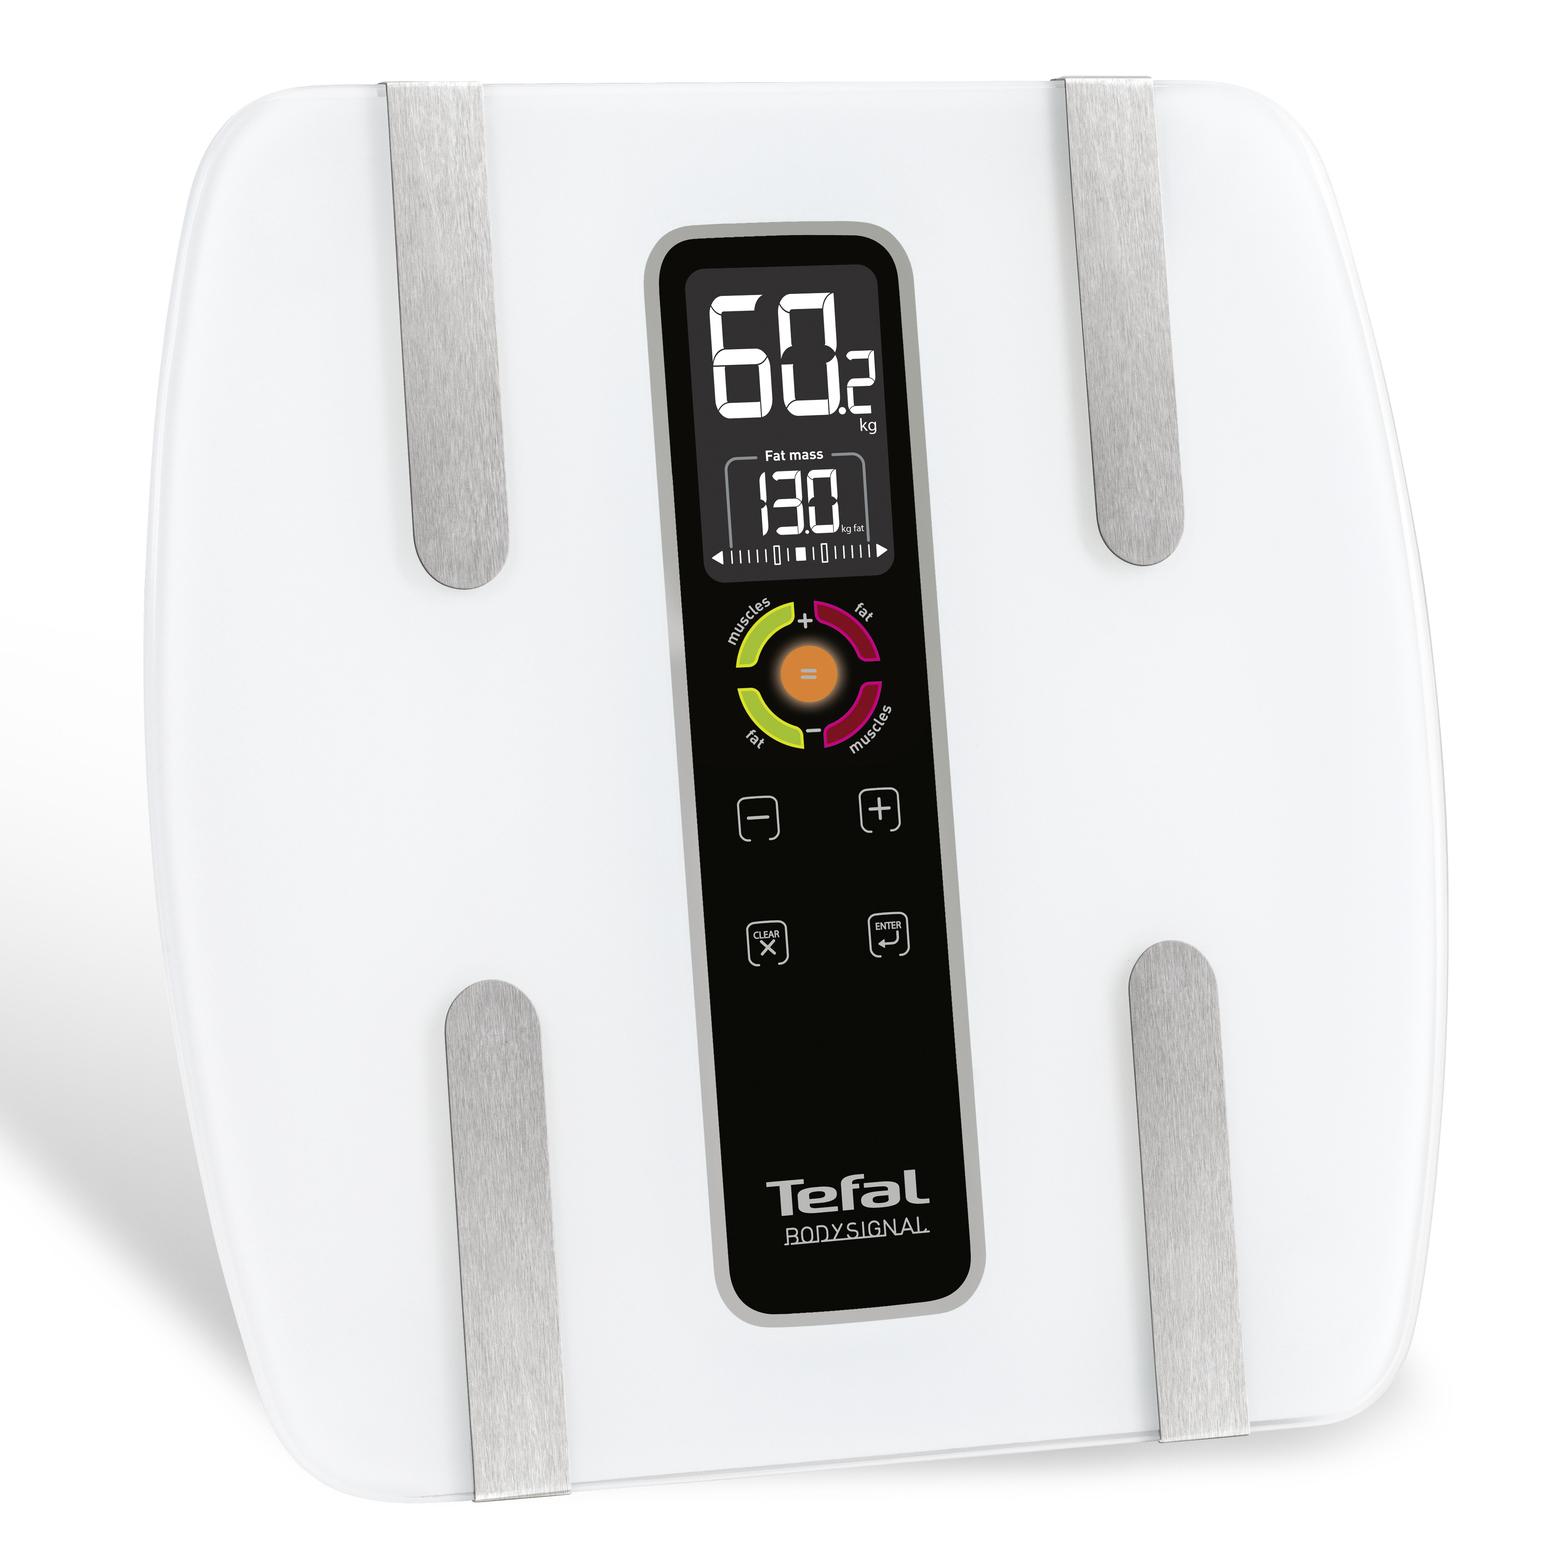 TEFAL_BodySignal_BM7100S6-1